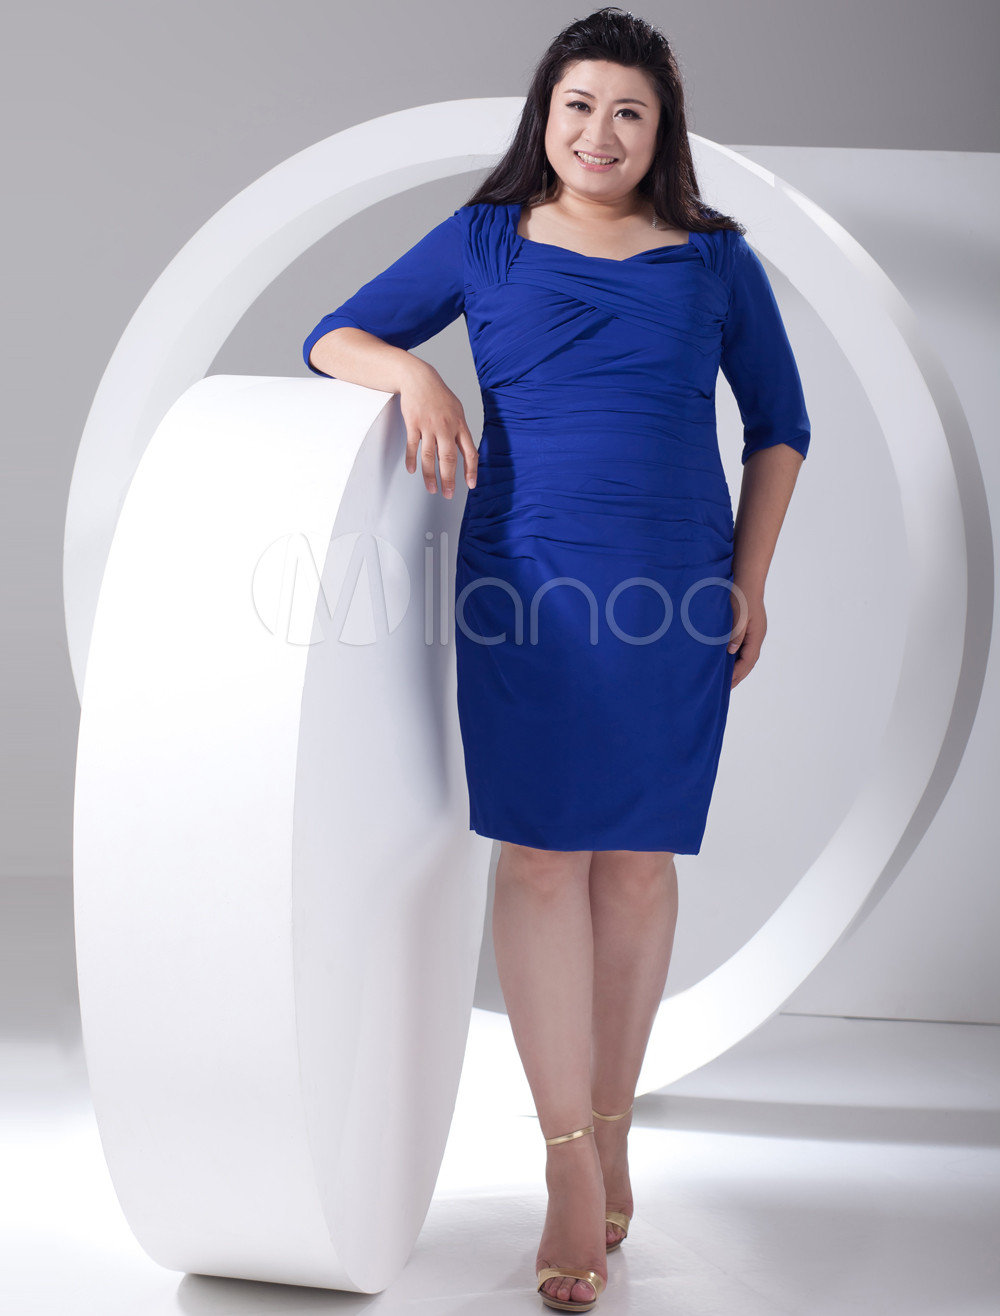 2013 Style Sheath Blue Chiffon Jewel Neck Plus Size Cocktail Dress